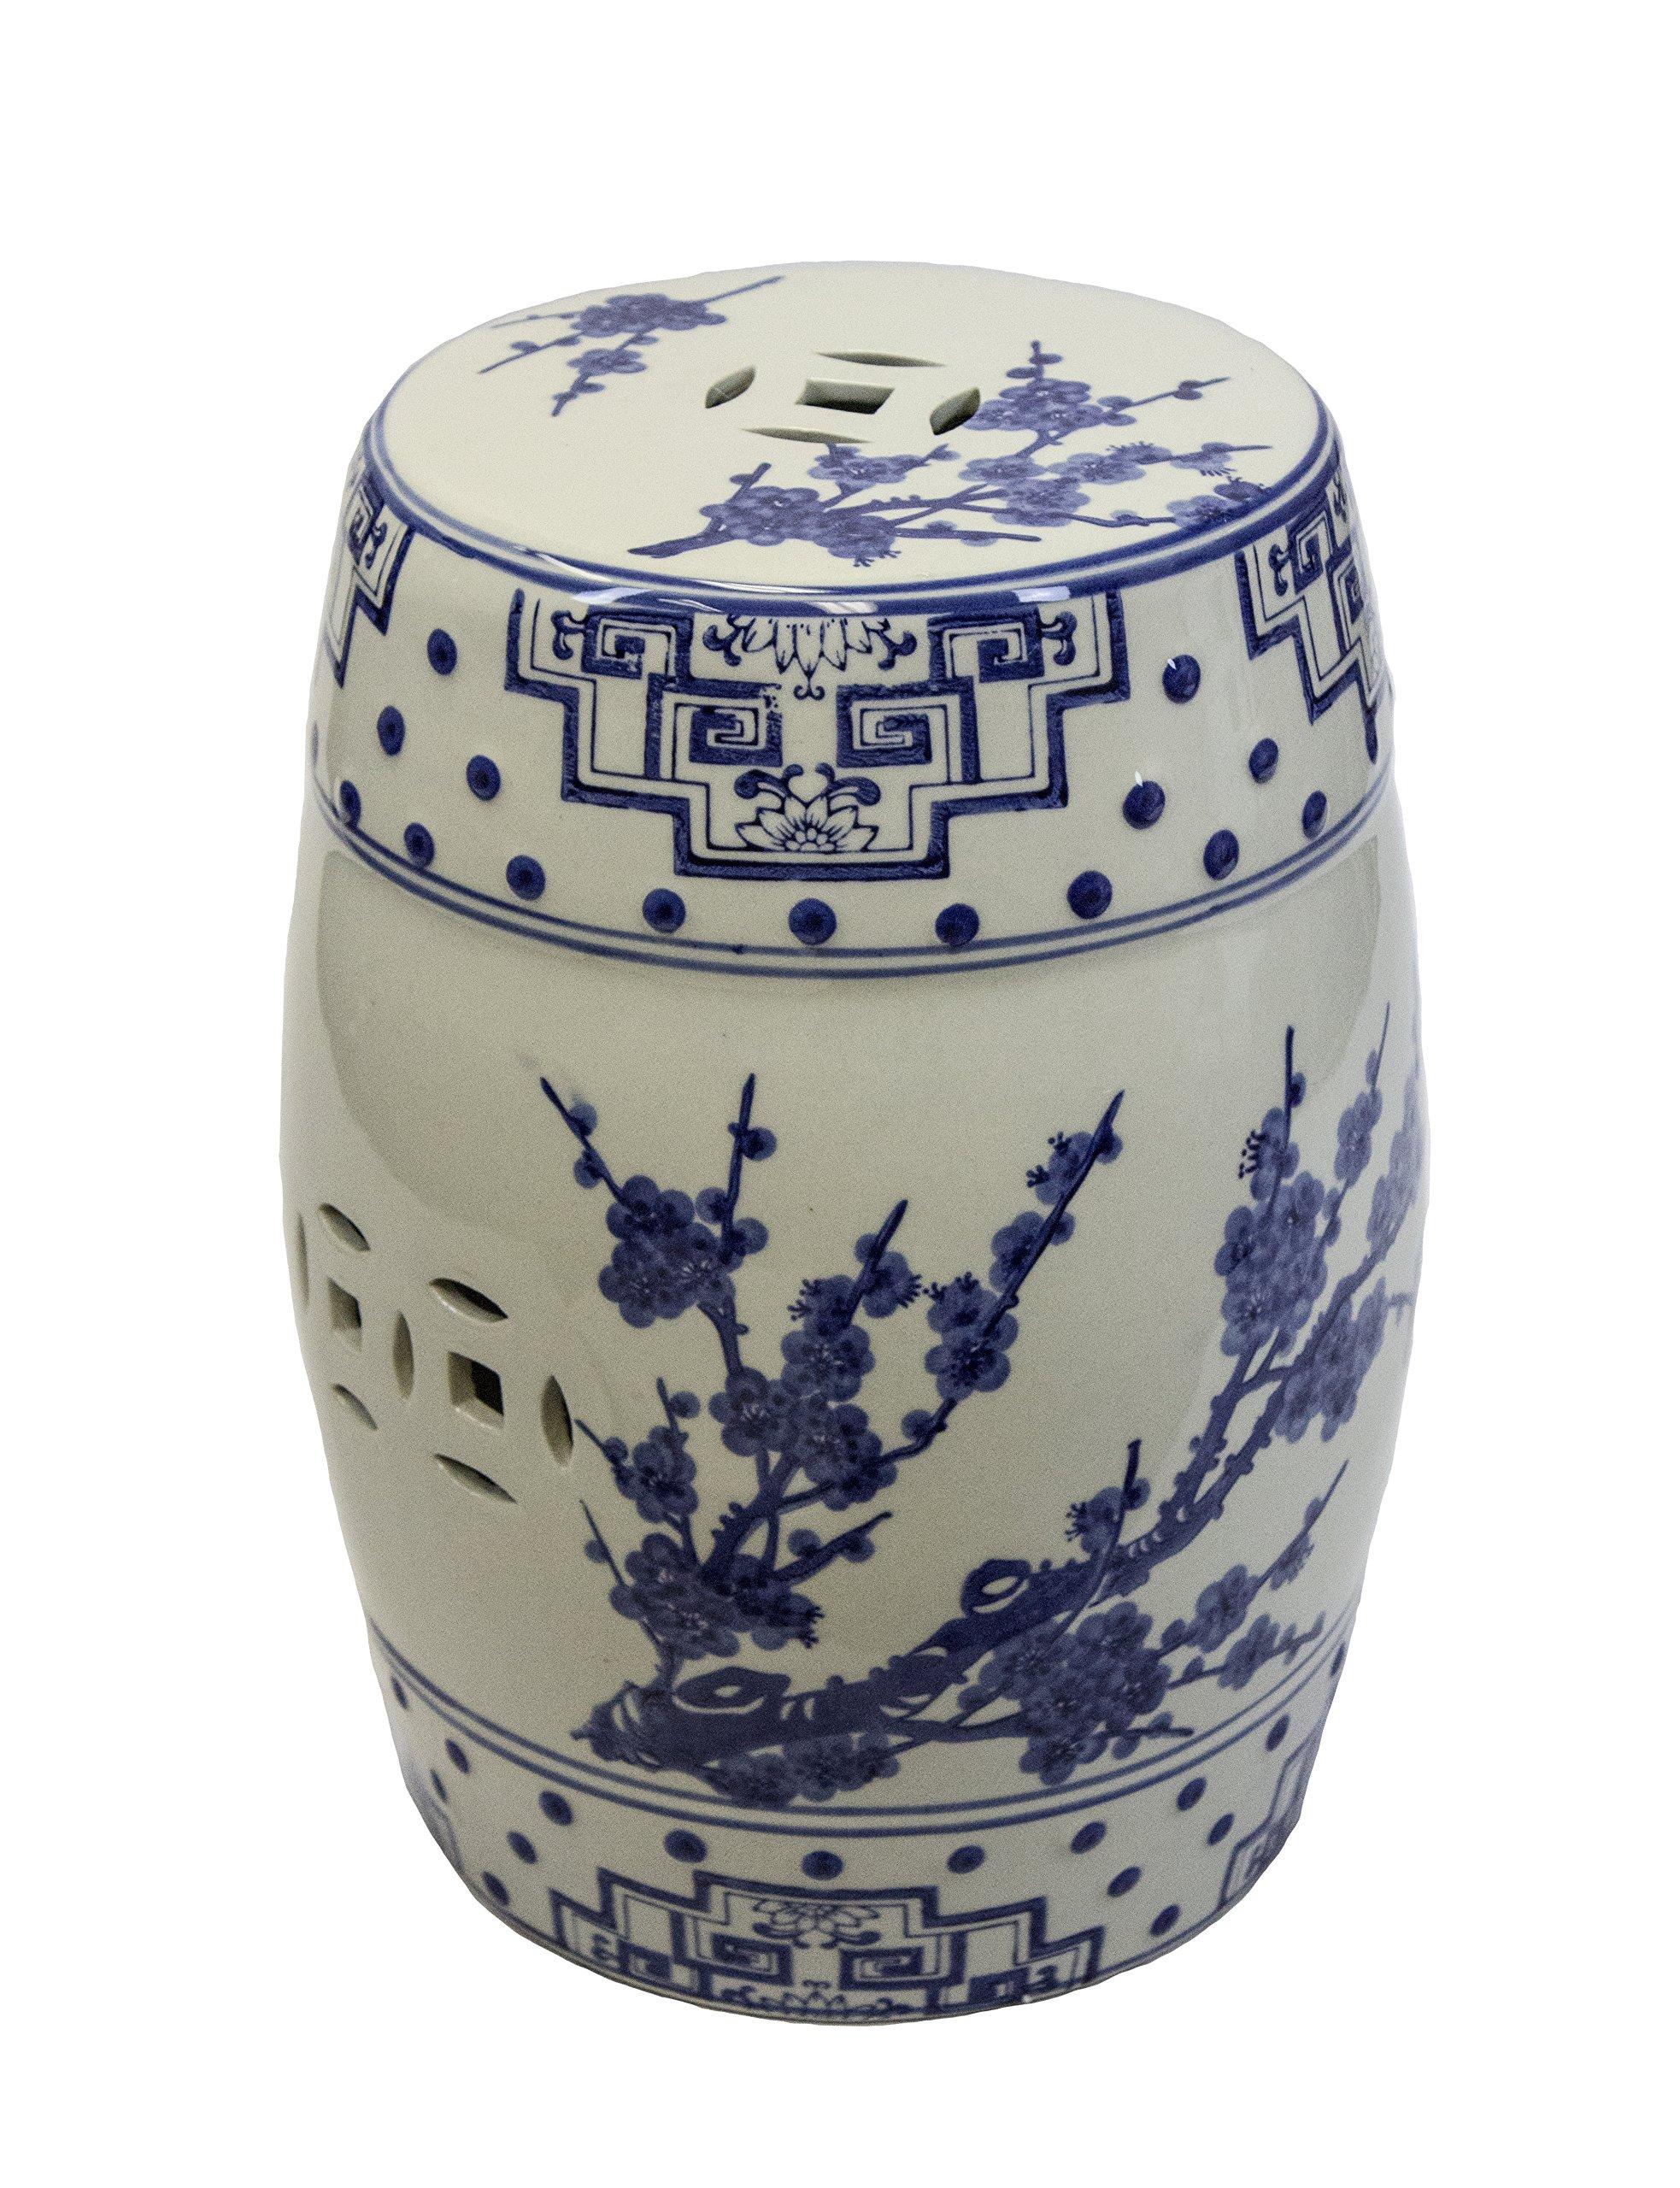 Sagebrook Home FC10455-01 Cherry Blossom Garden Stool, Blue/White Ceramic, 12.75 x 12.75 x 17.5 Inches